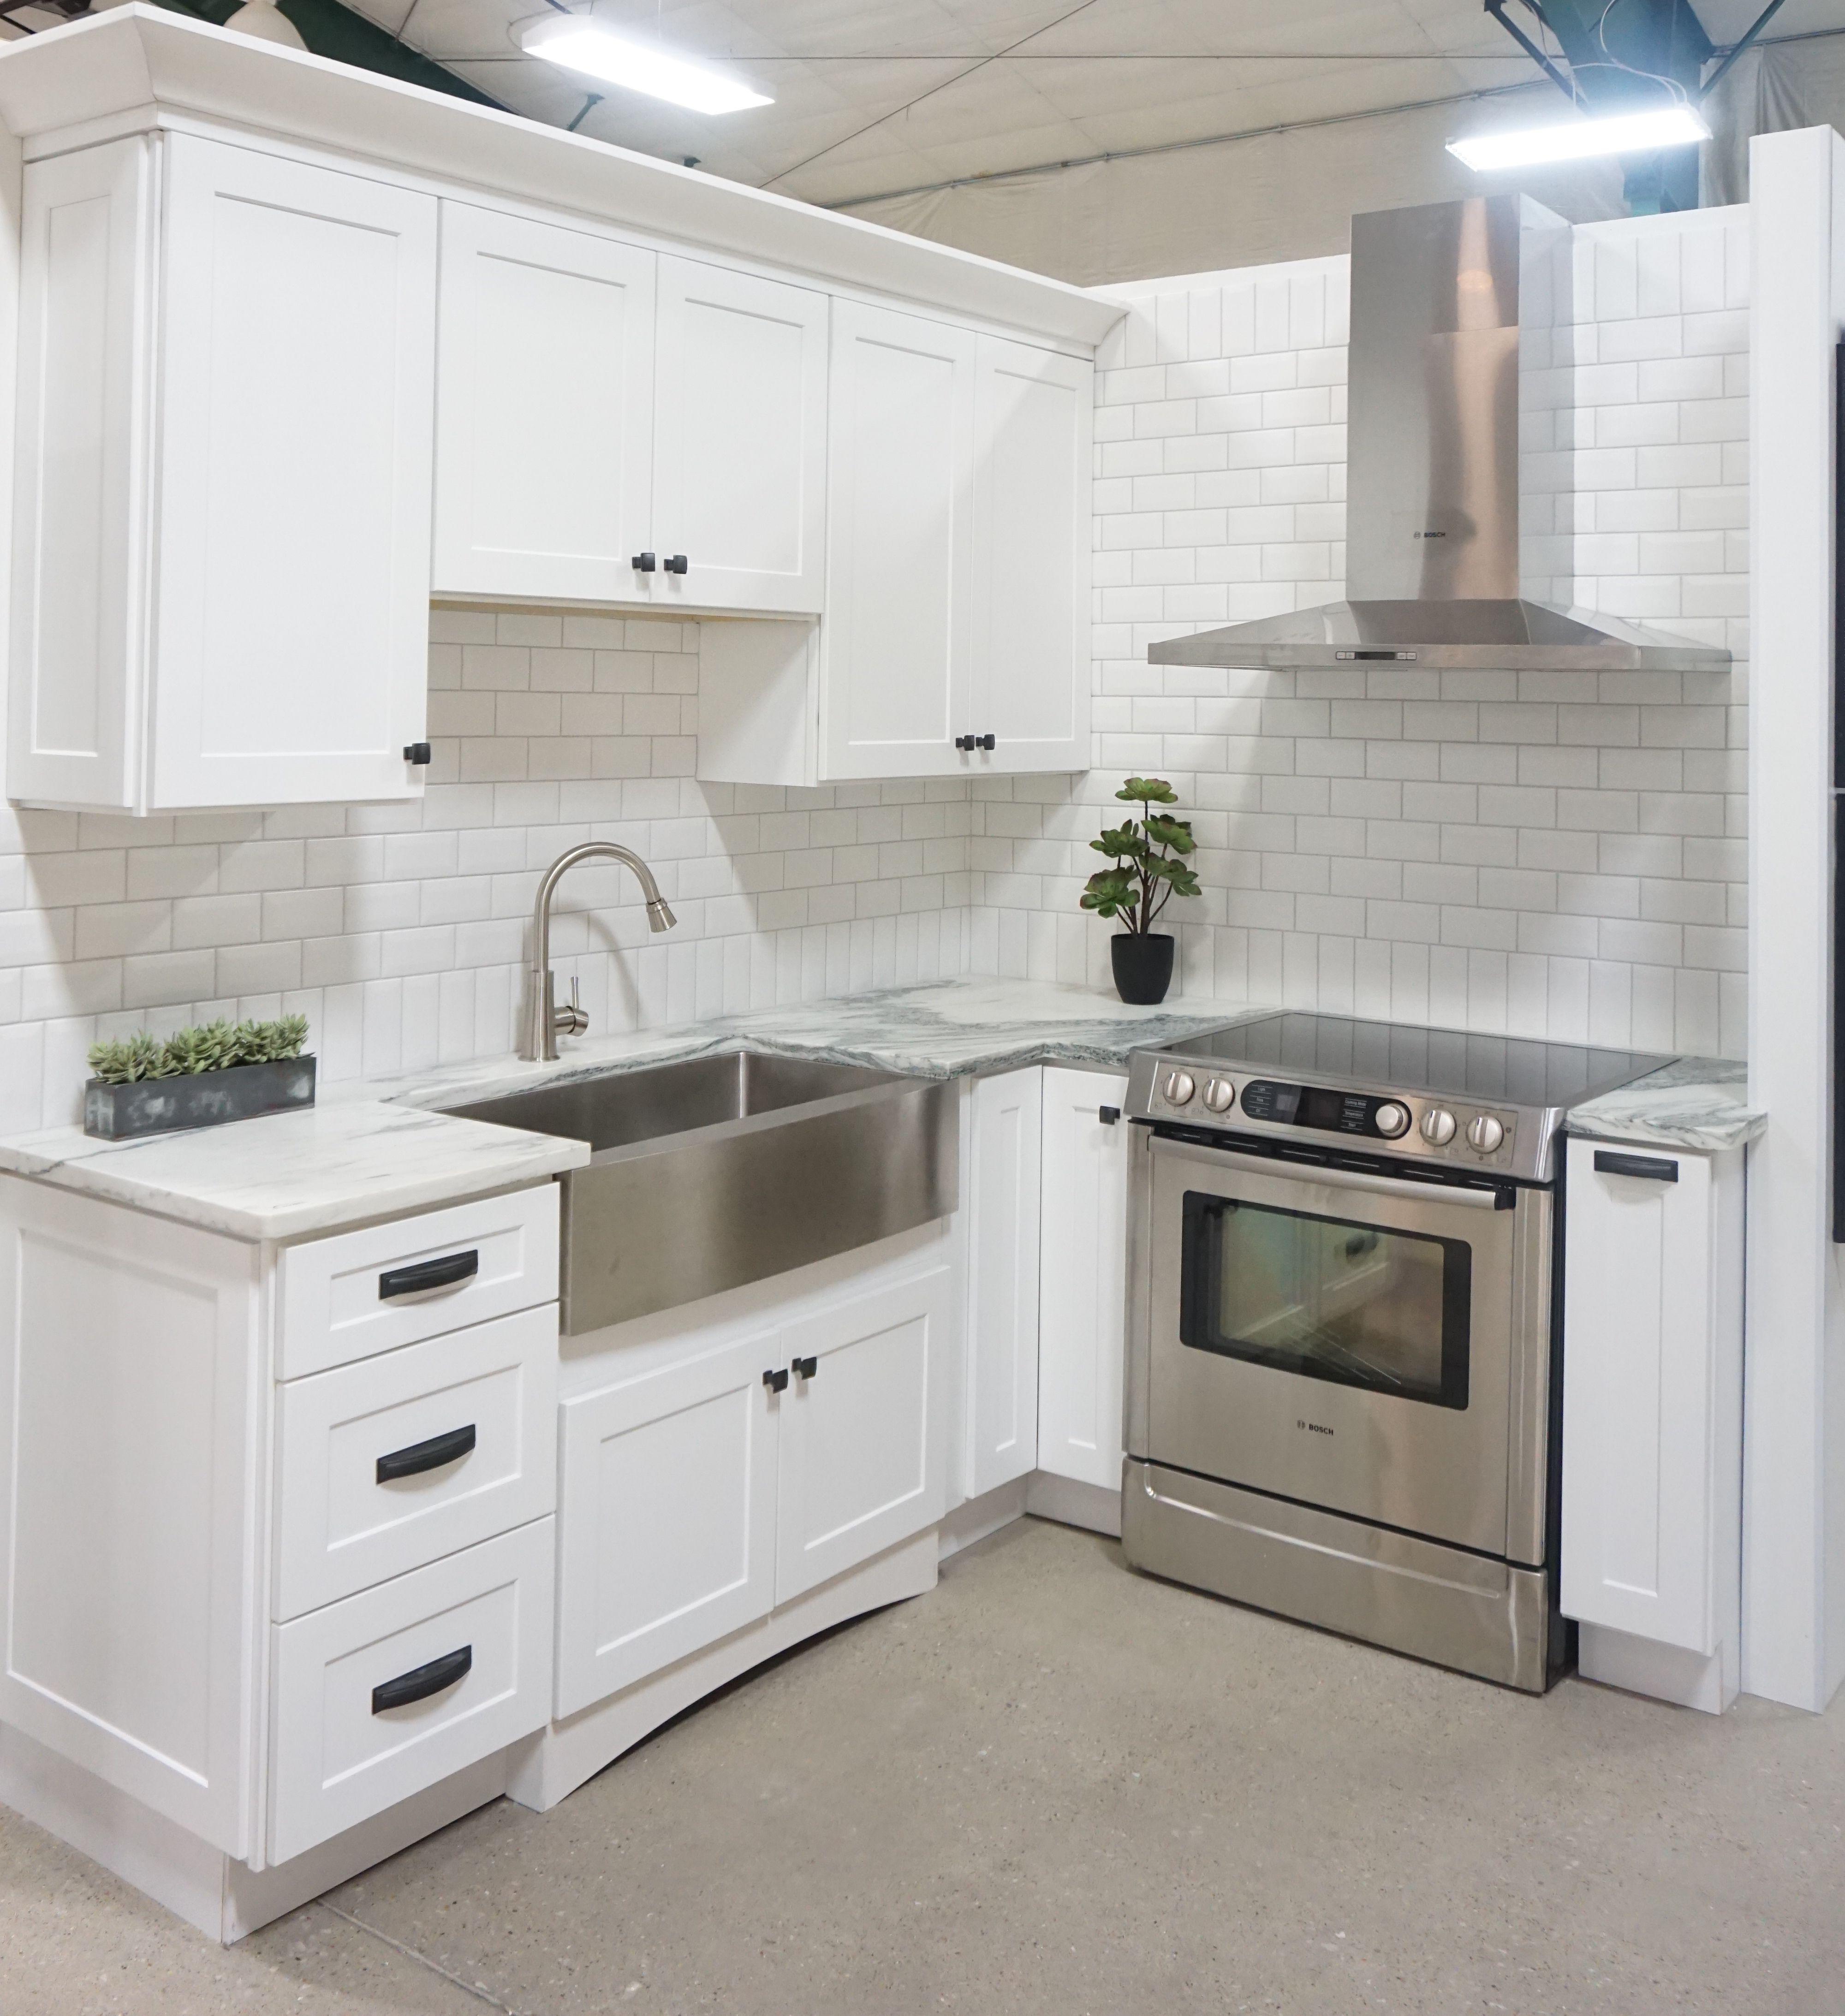 White shaker door style, white marble